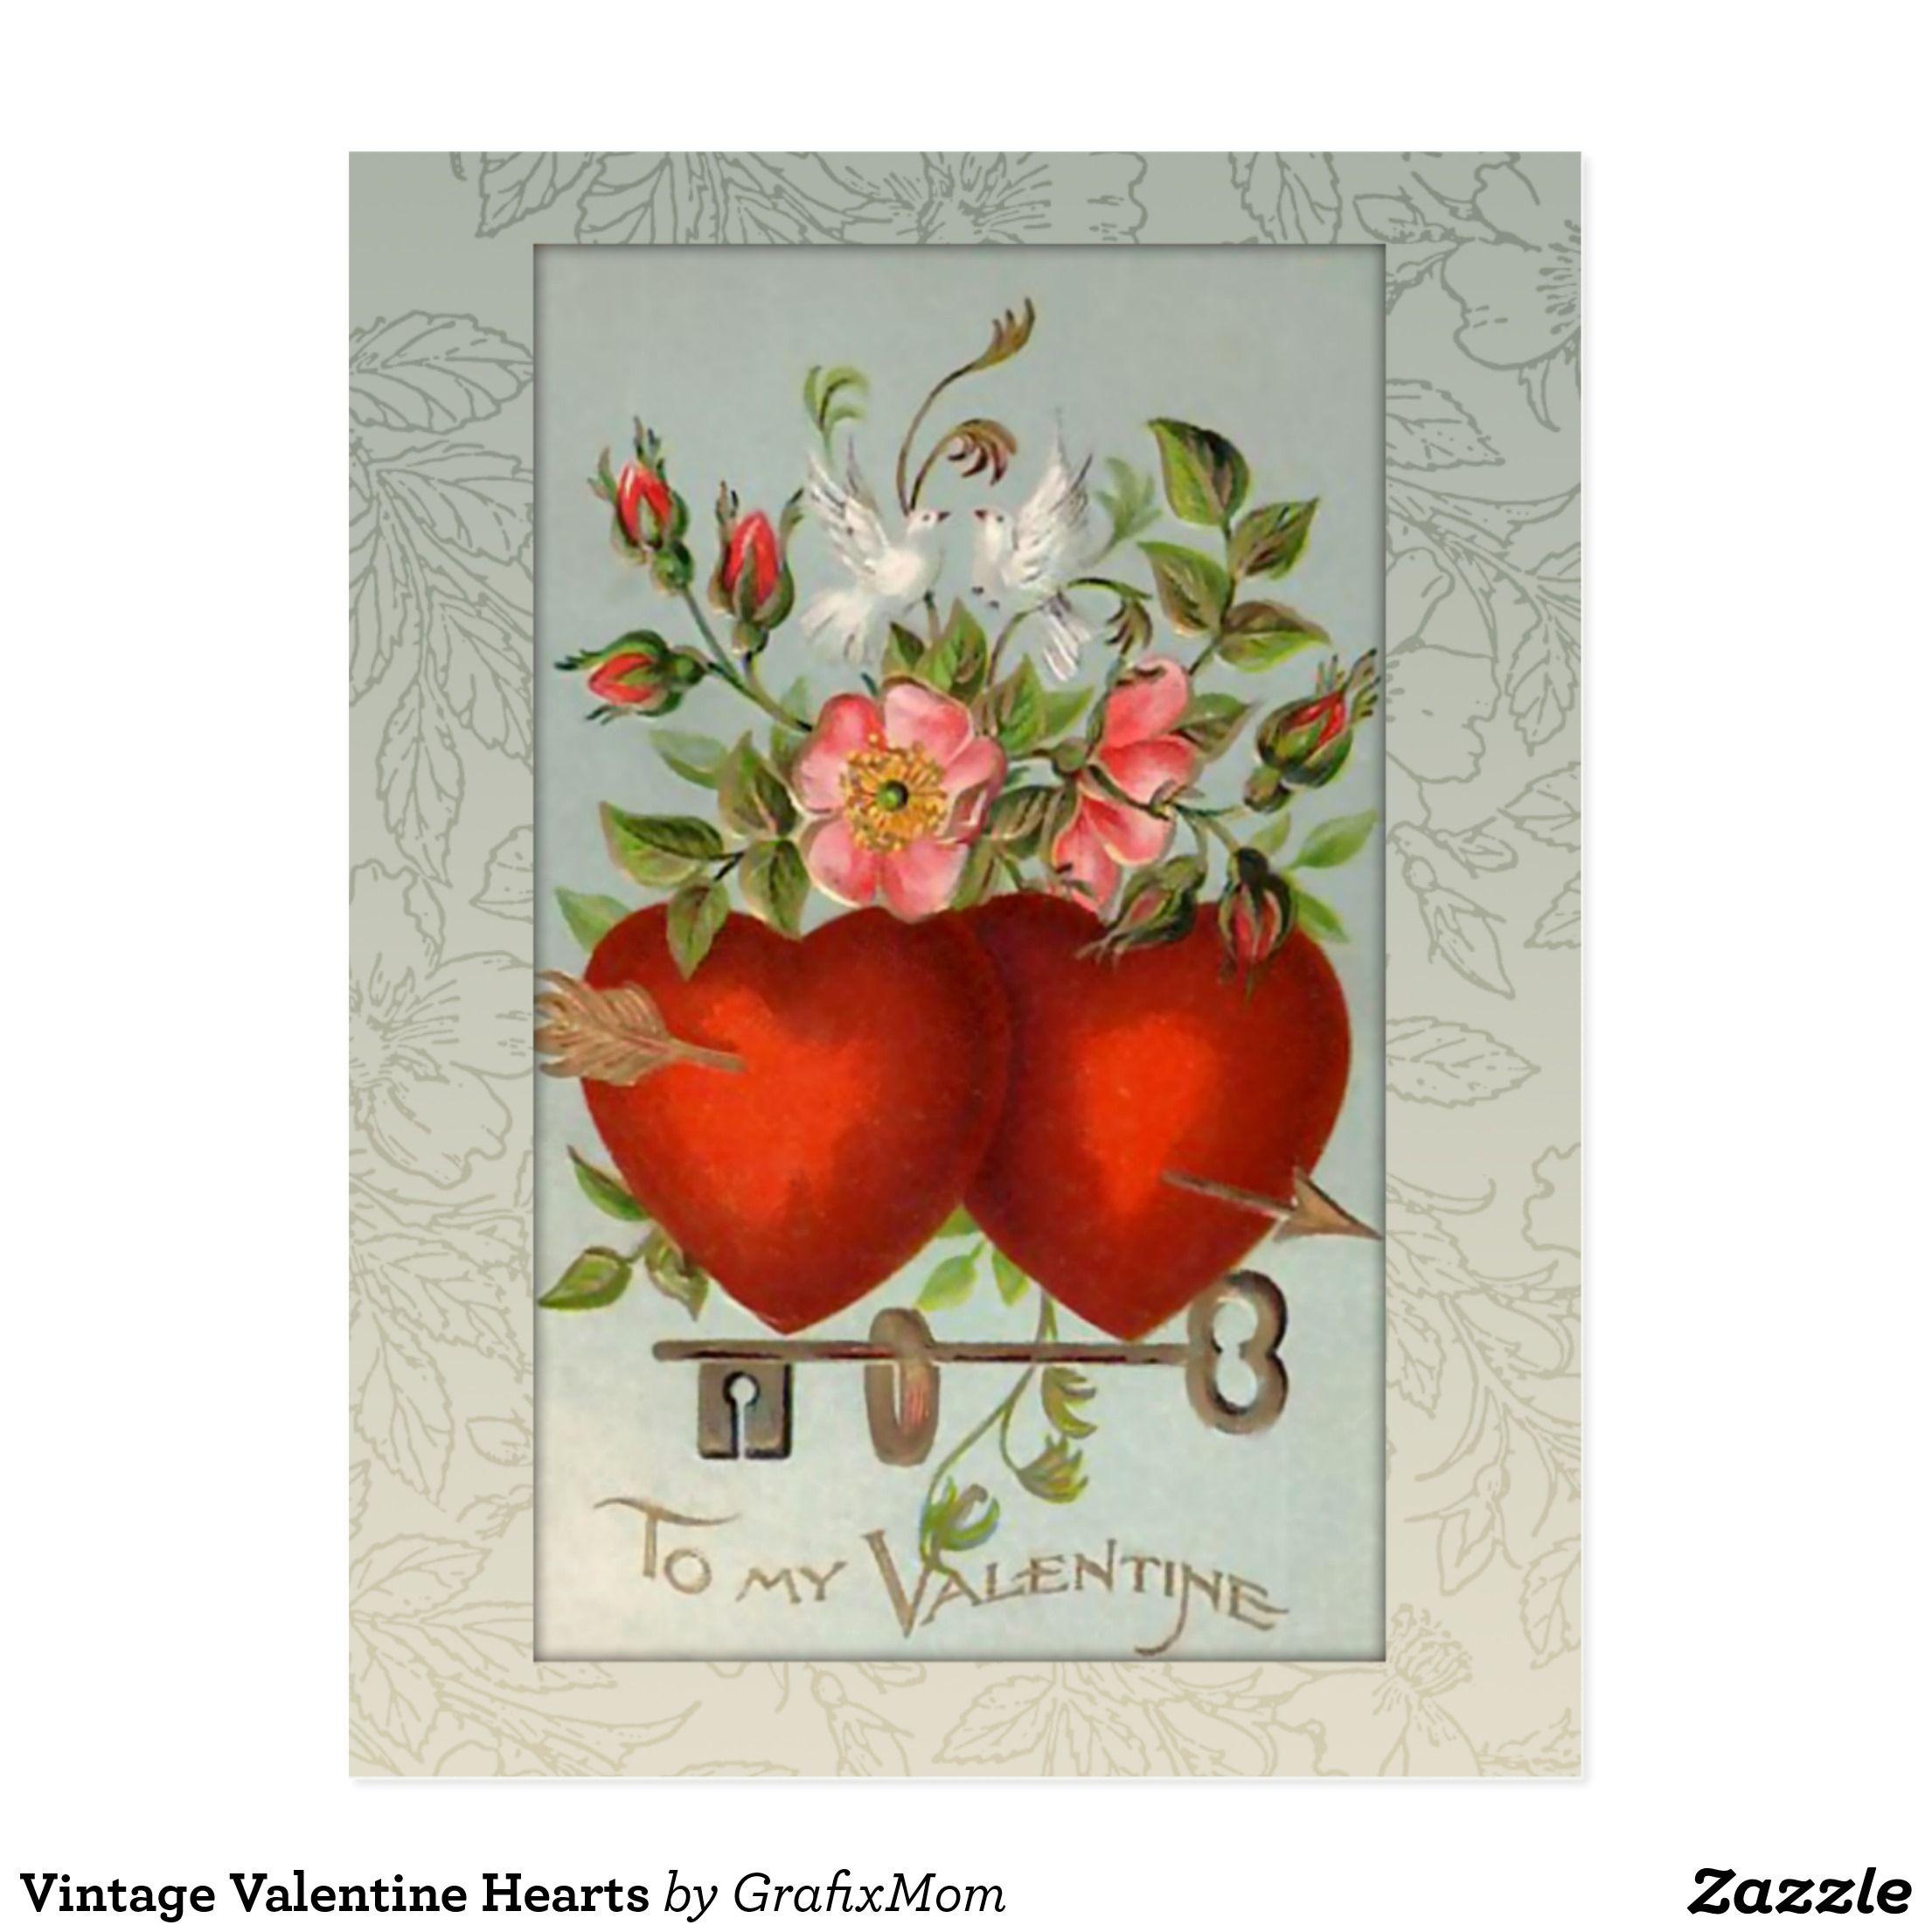 Vintage Valentine Hearts Holiday Postcard